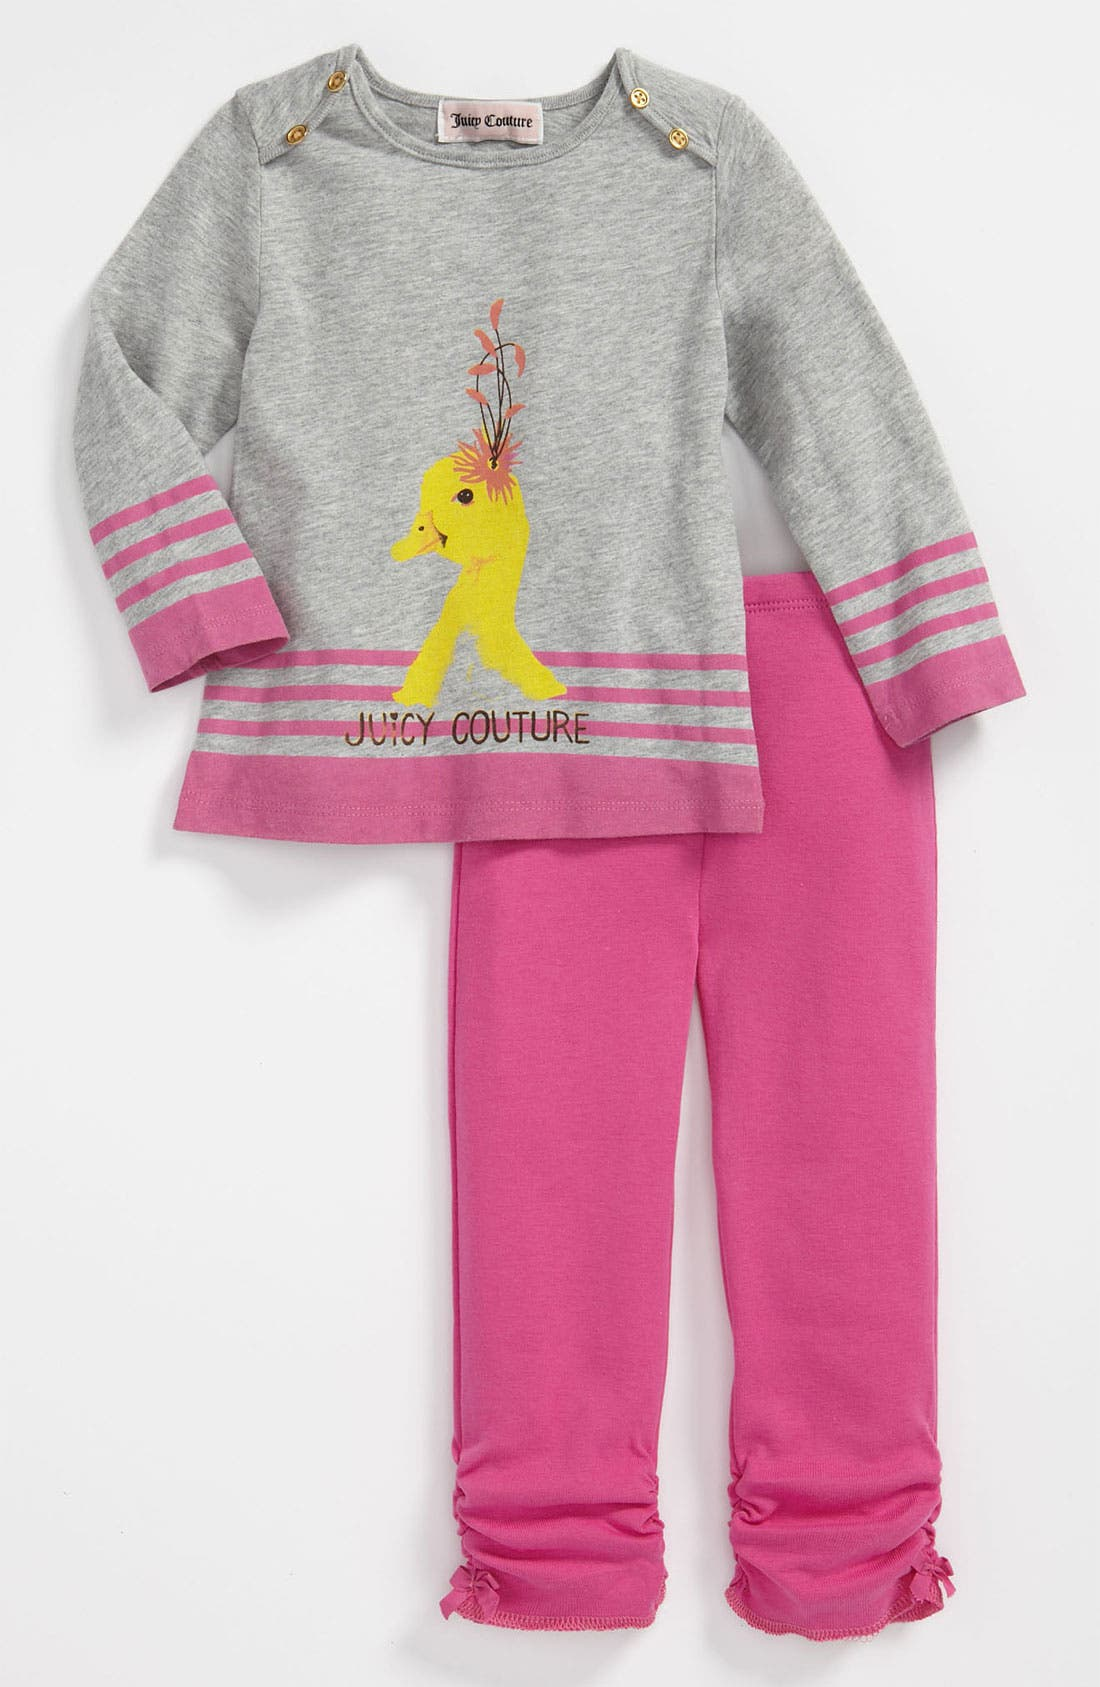 Main Image - Juicy Couture Knit Shirt & Leggings (Infant)